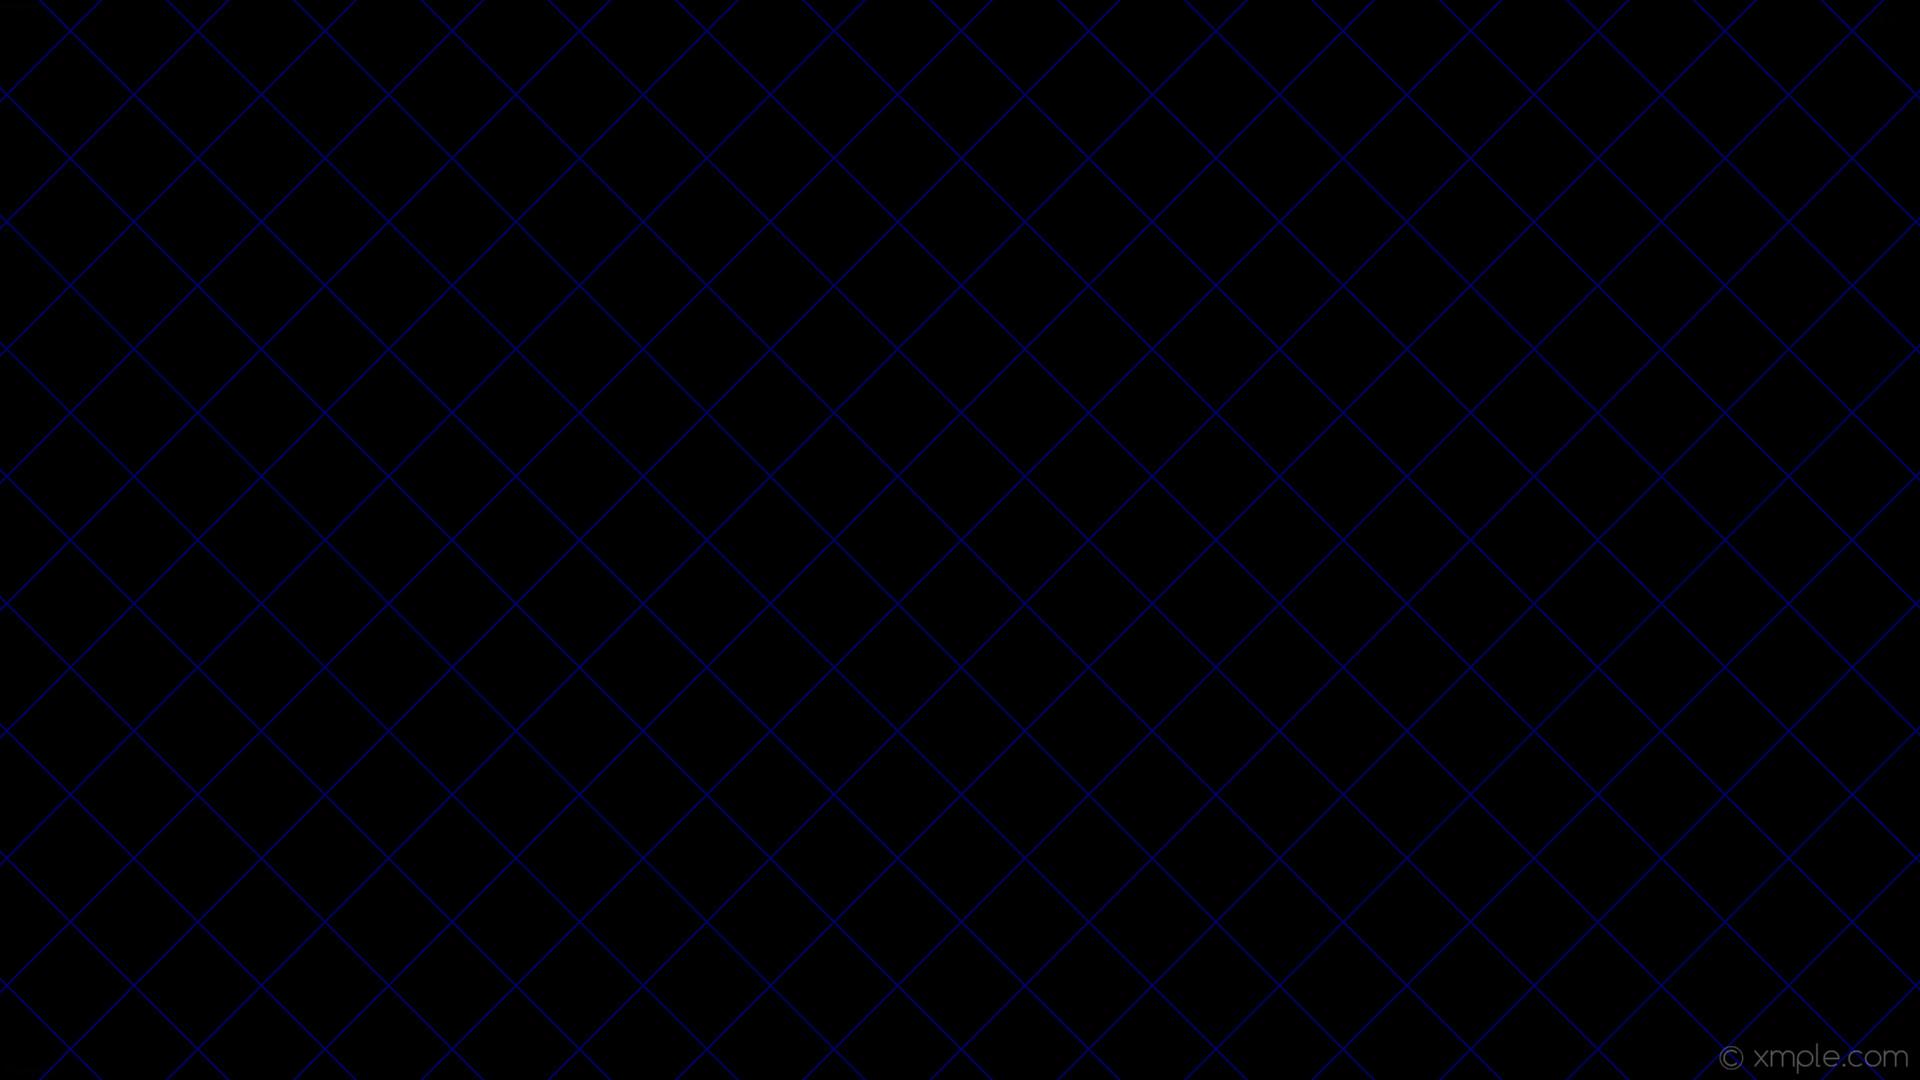 Wallpaper white graph paper blue grid #0000cd #ffffff 15° 9px 360px